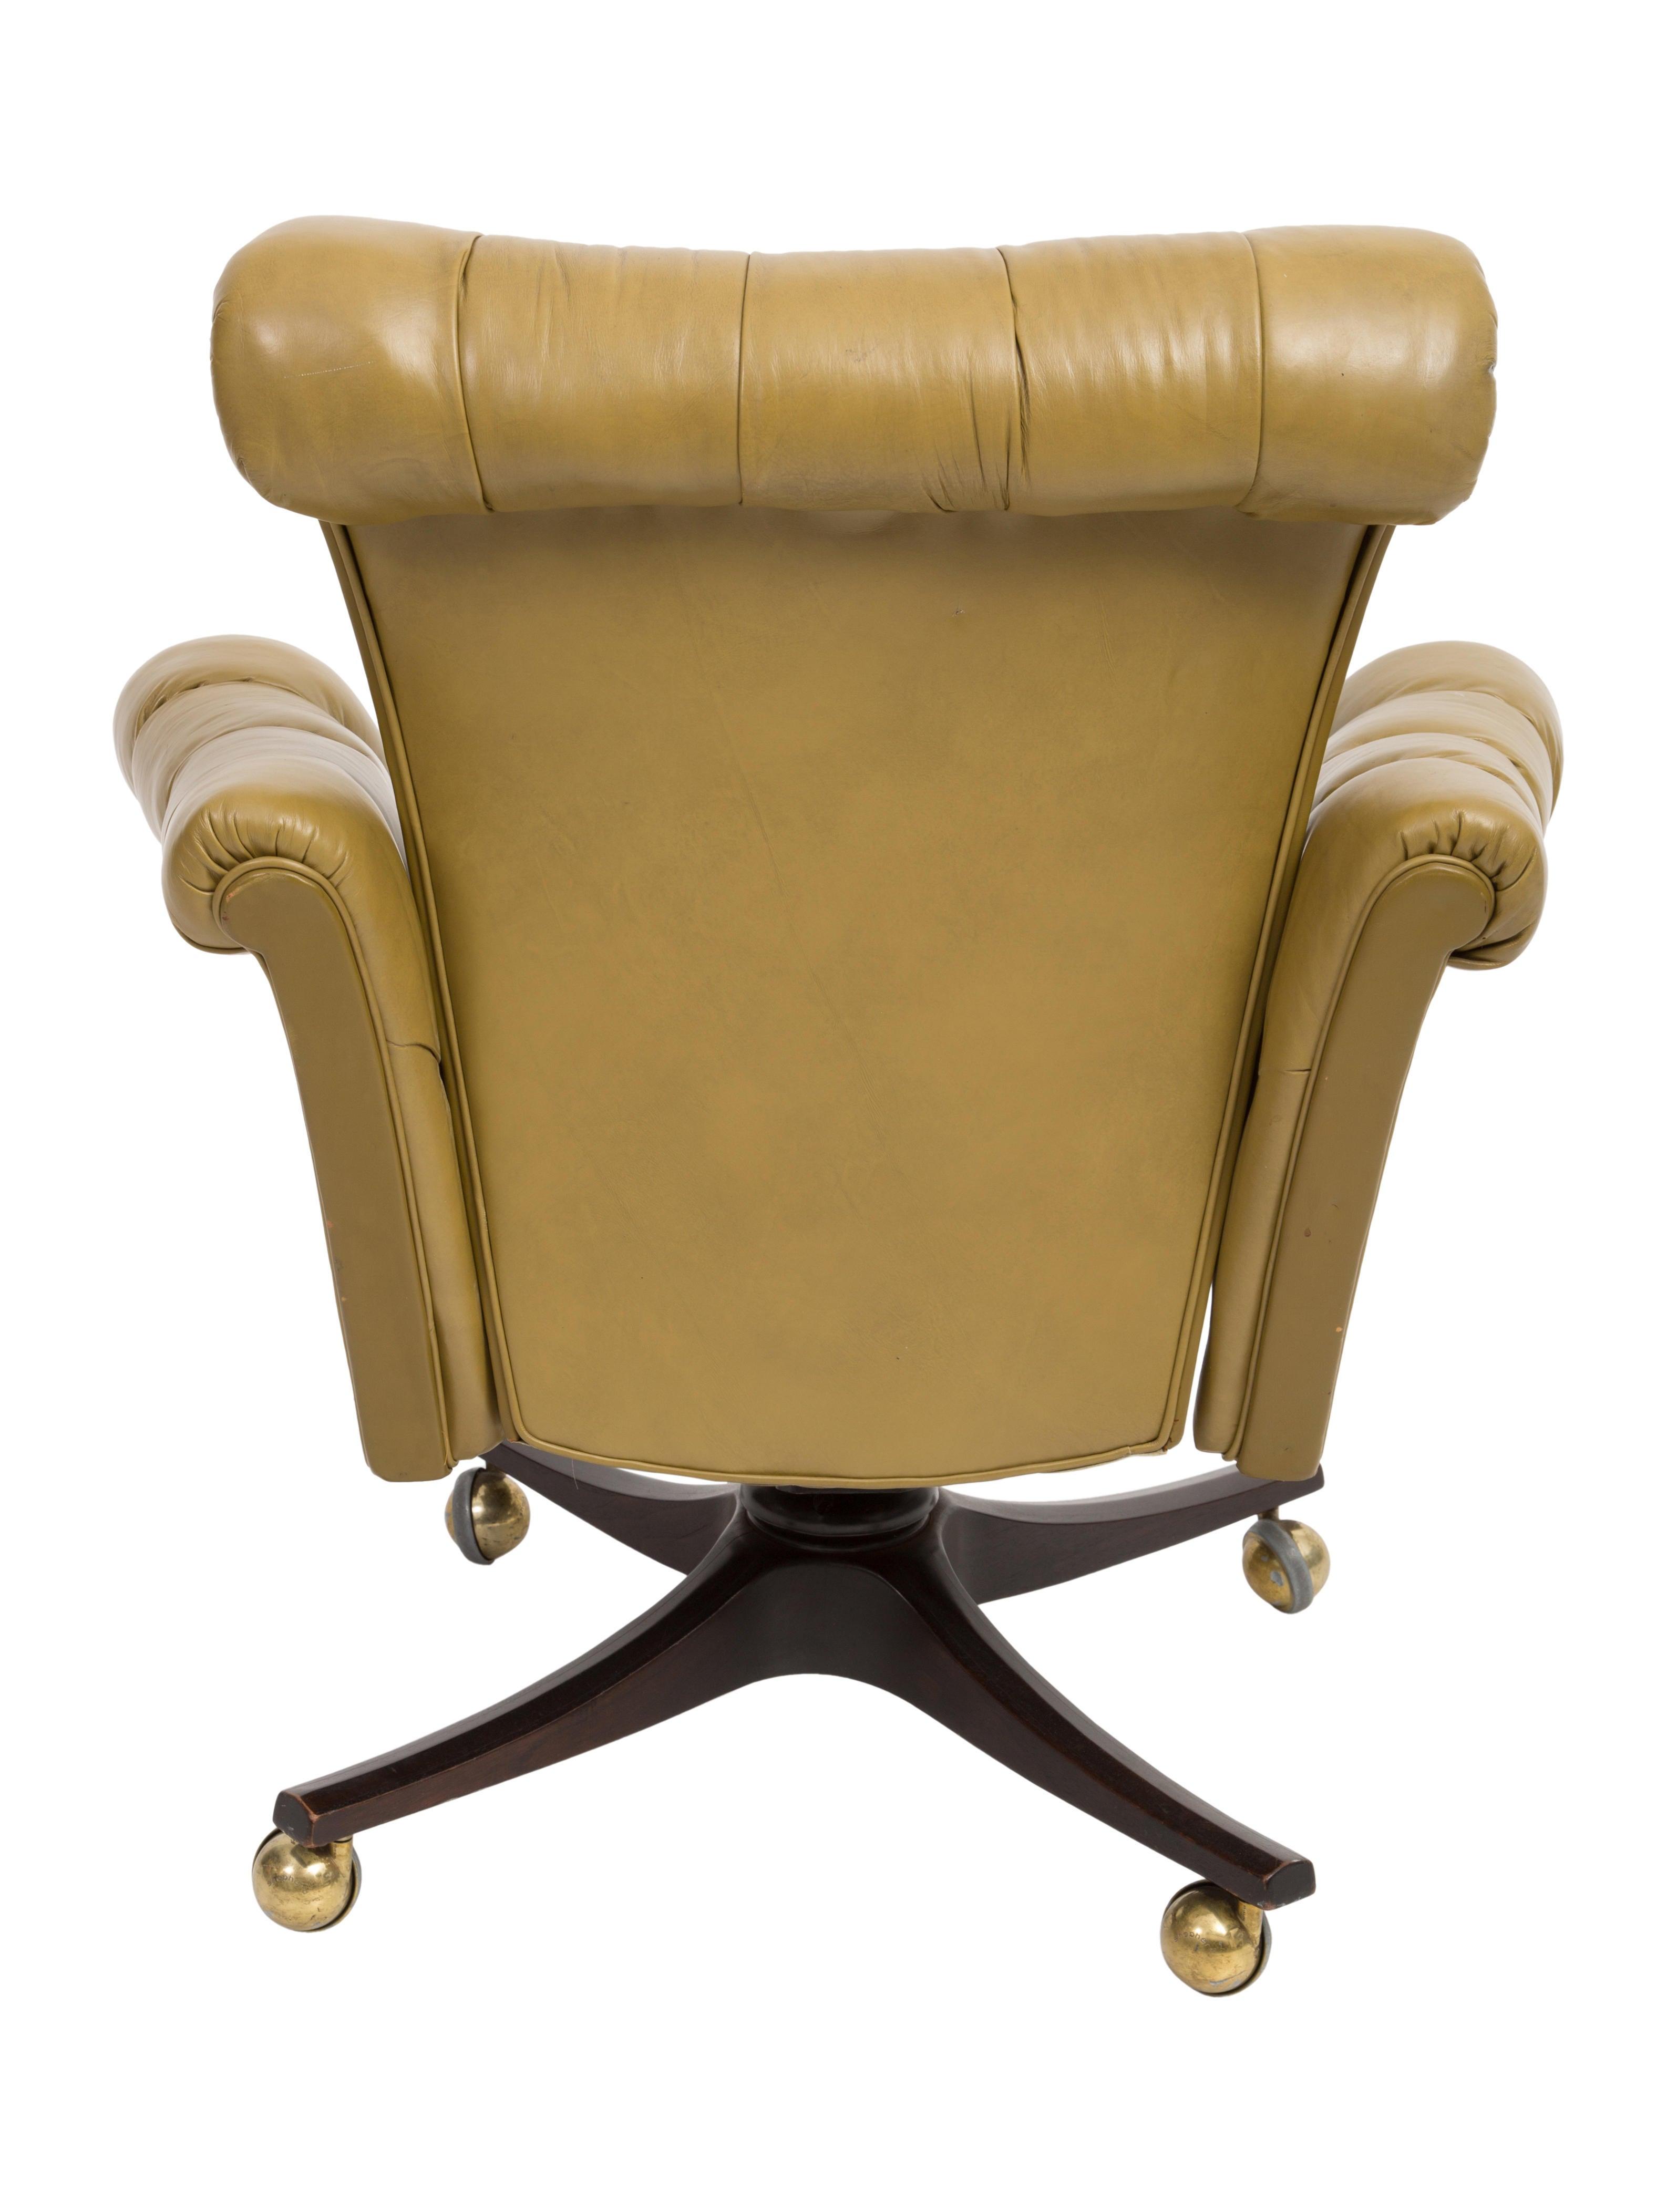 Edward wormley executive desk chair furniture edw20002 the realreal - Edward wormley chairs ...